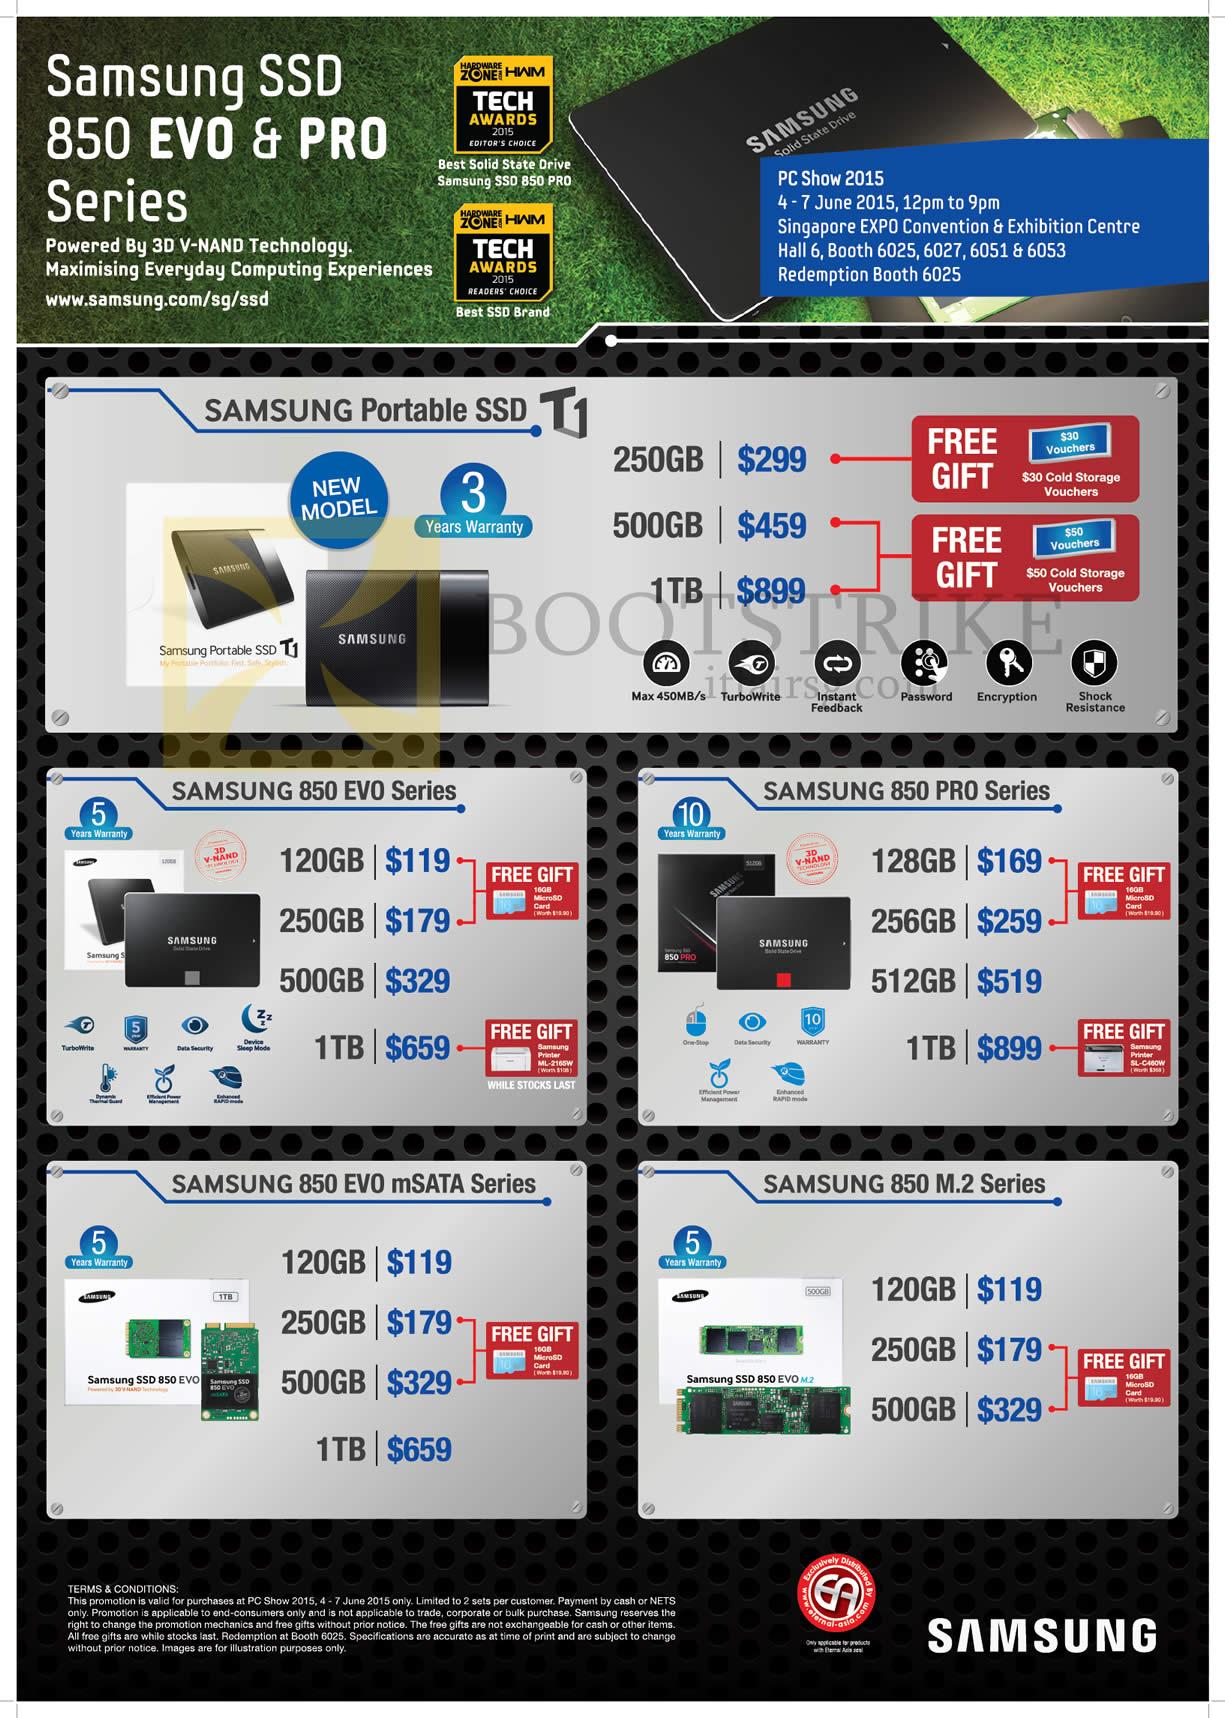 PC SHOW 2015 price list image brochure of Samsung SSD Portable, 850 Evo, Pro, MSATA, M2, 120GB 250GB 500GB 512GB 1TB